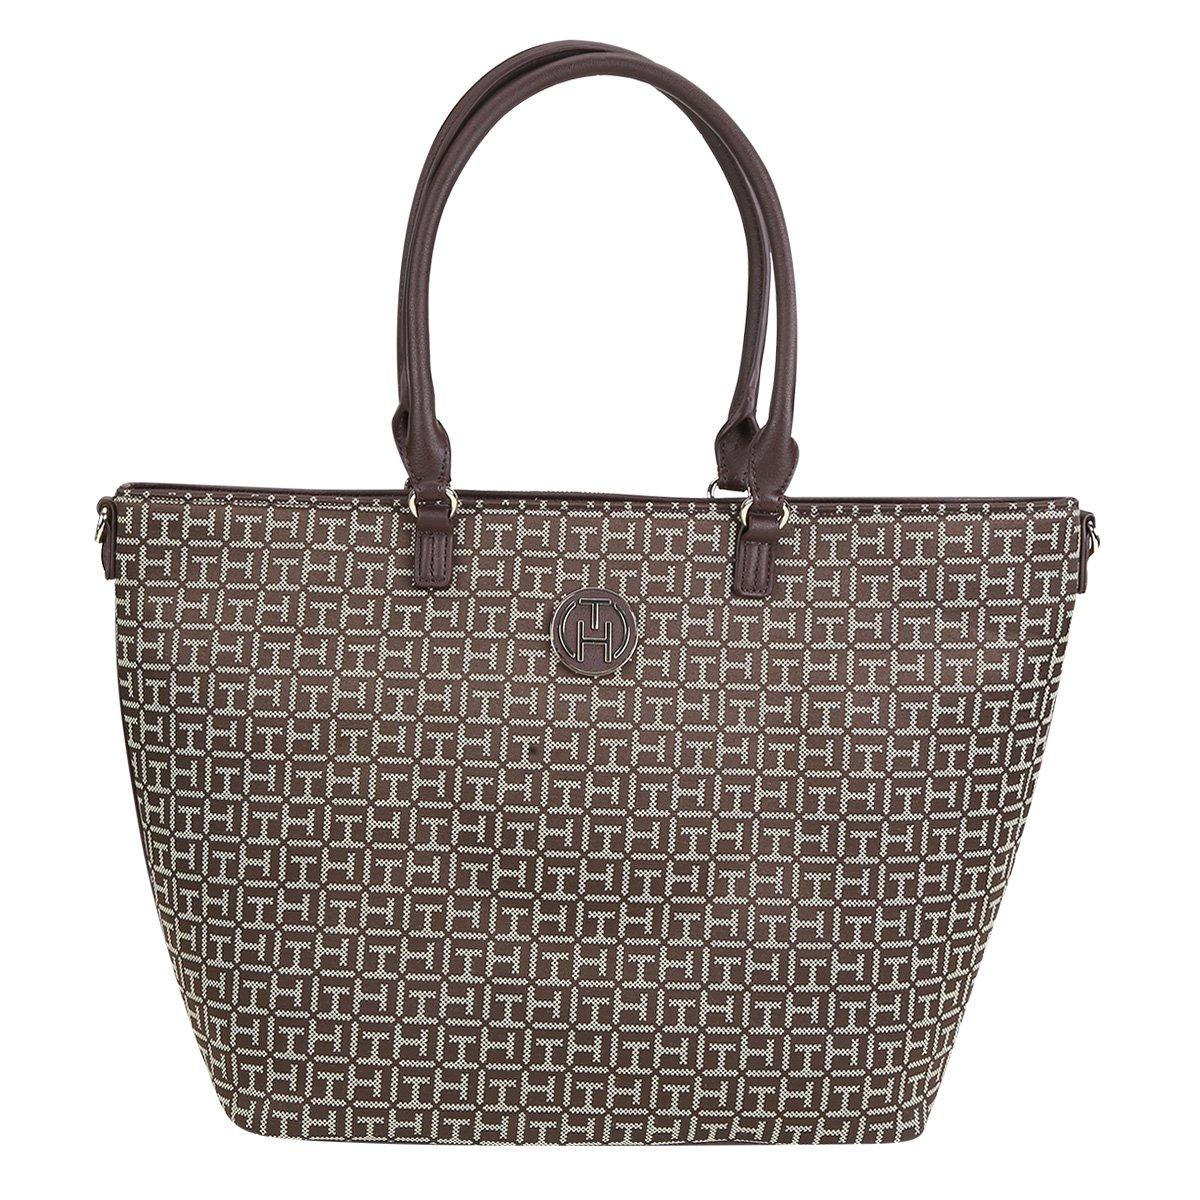 a855730084a31 Bolsa Tommy Hilfiger Tote Jacquard Feminina - Compre Agora